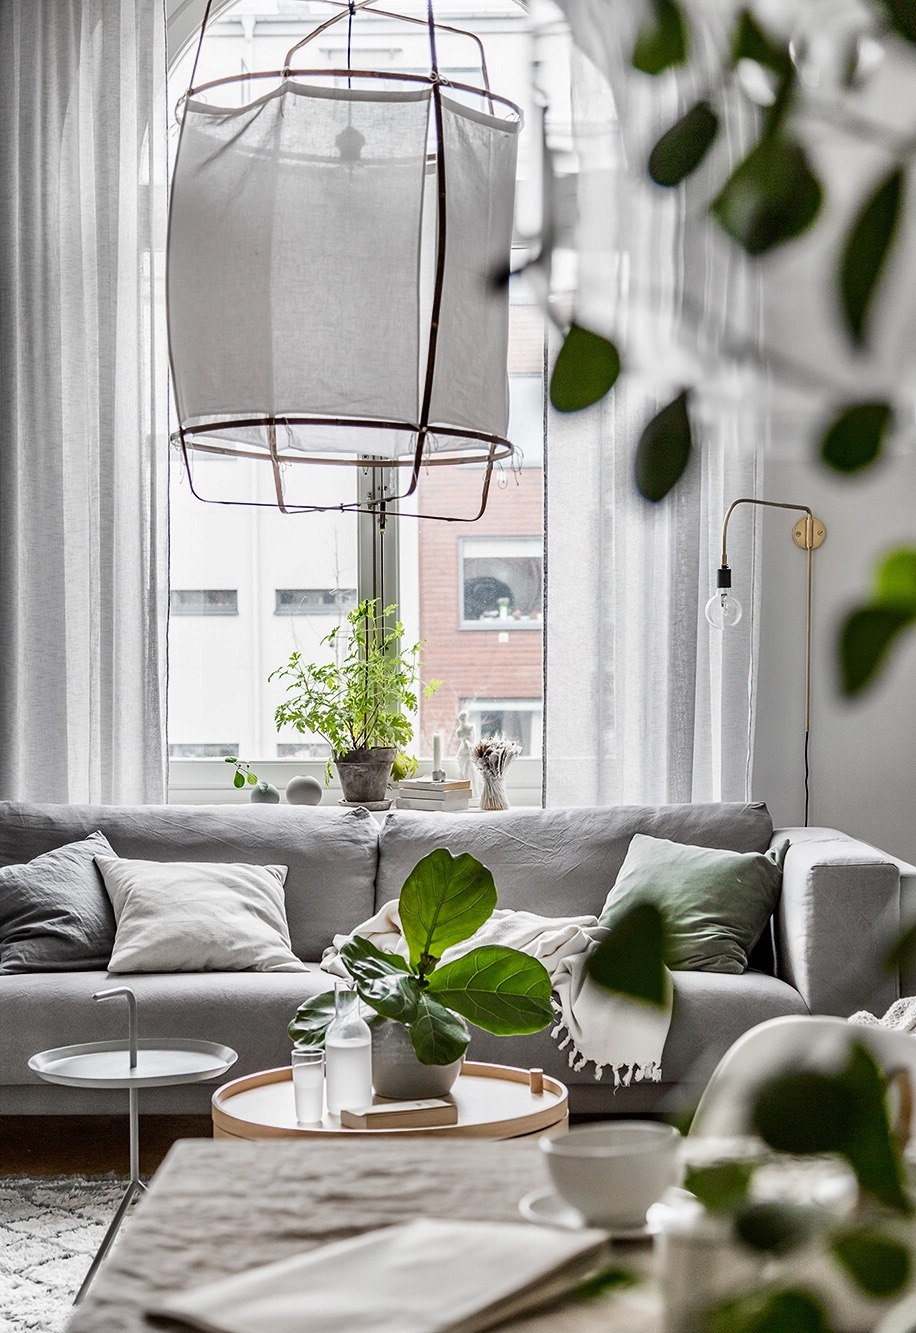 The former Swedish apartment of Jasmina Bylund